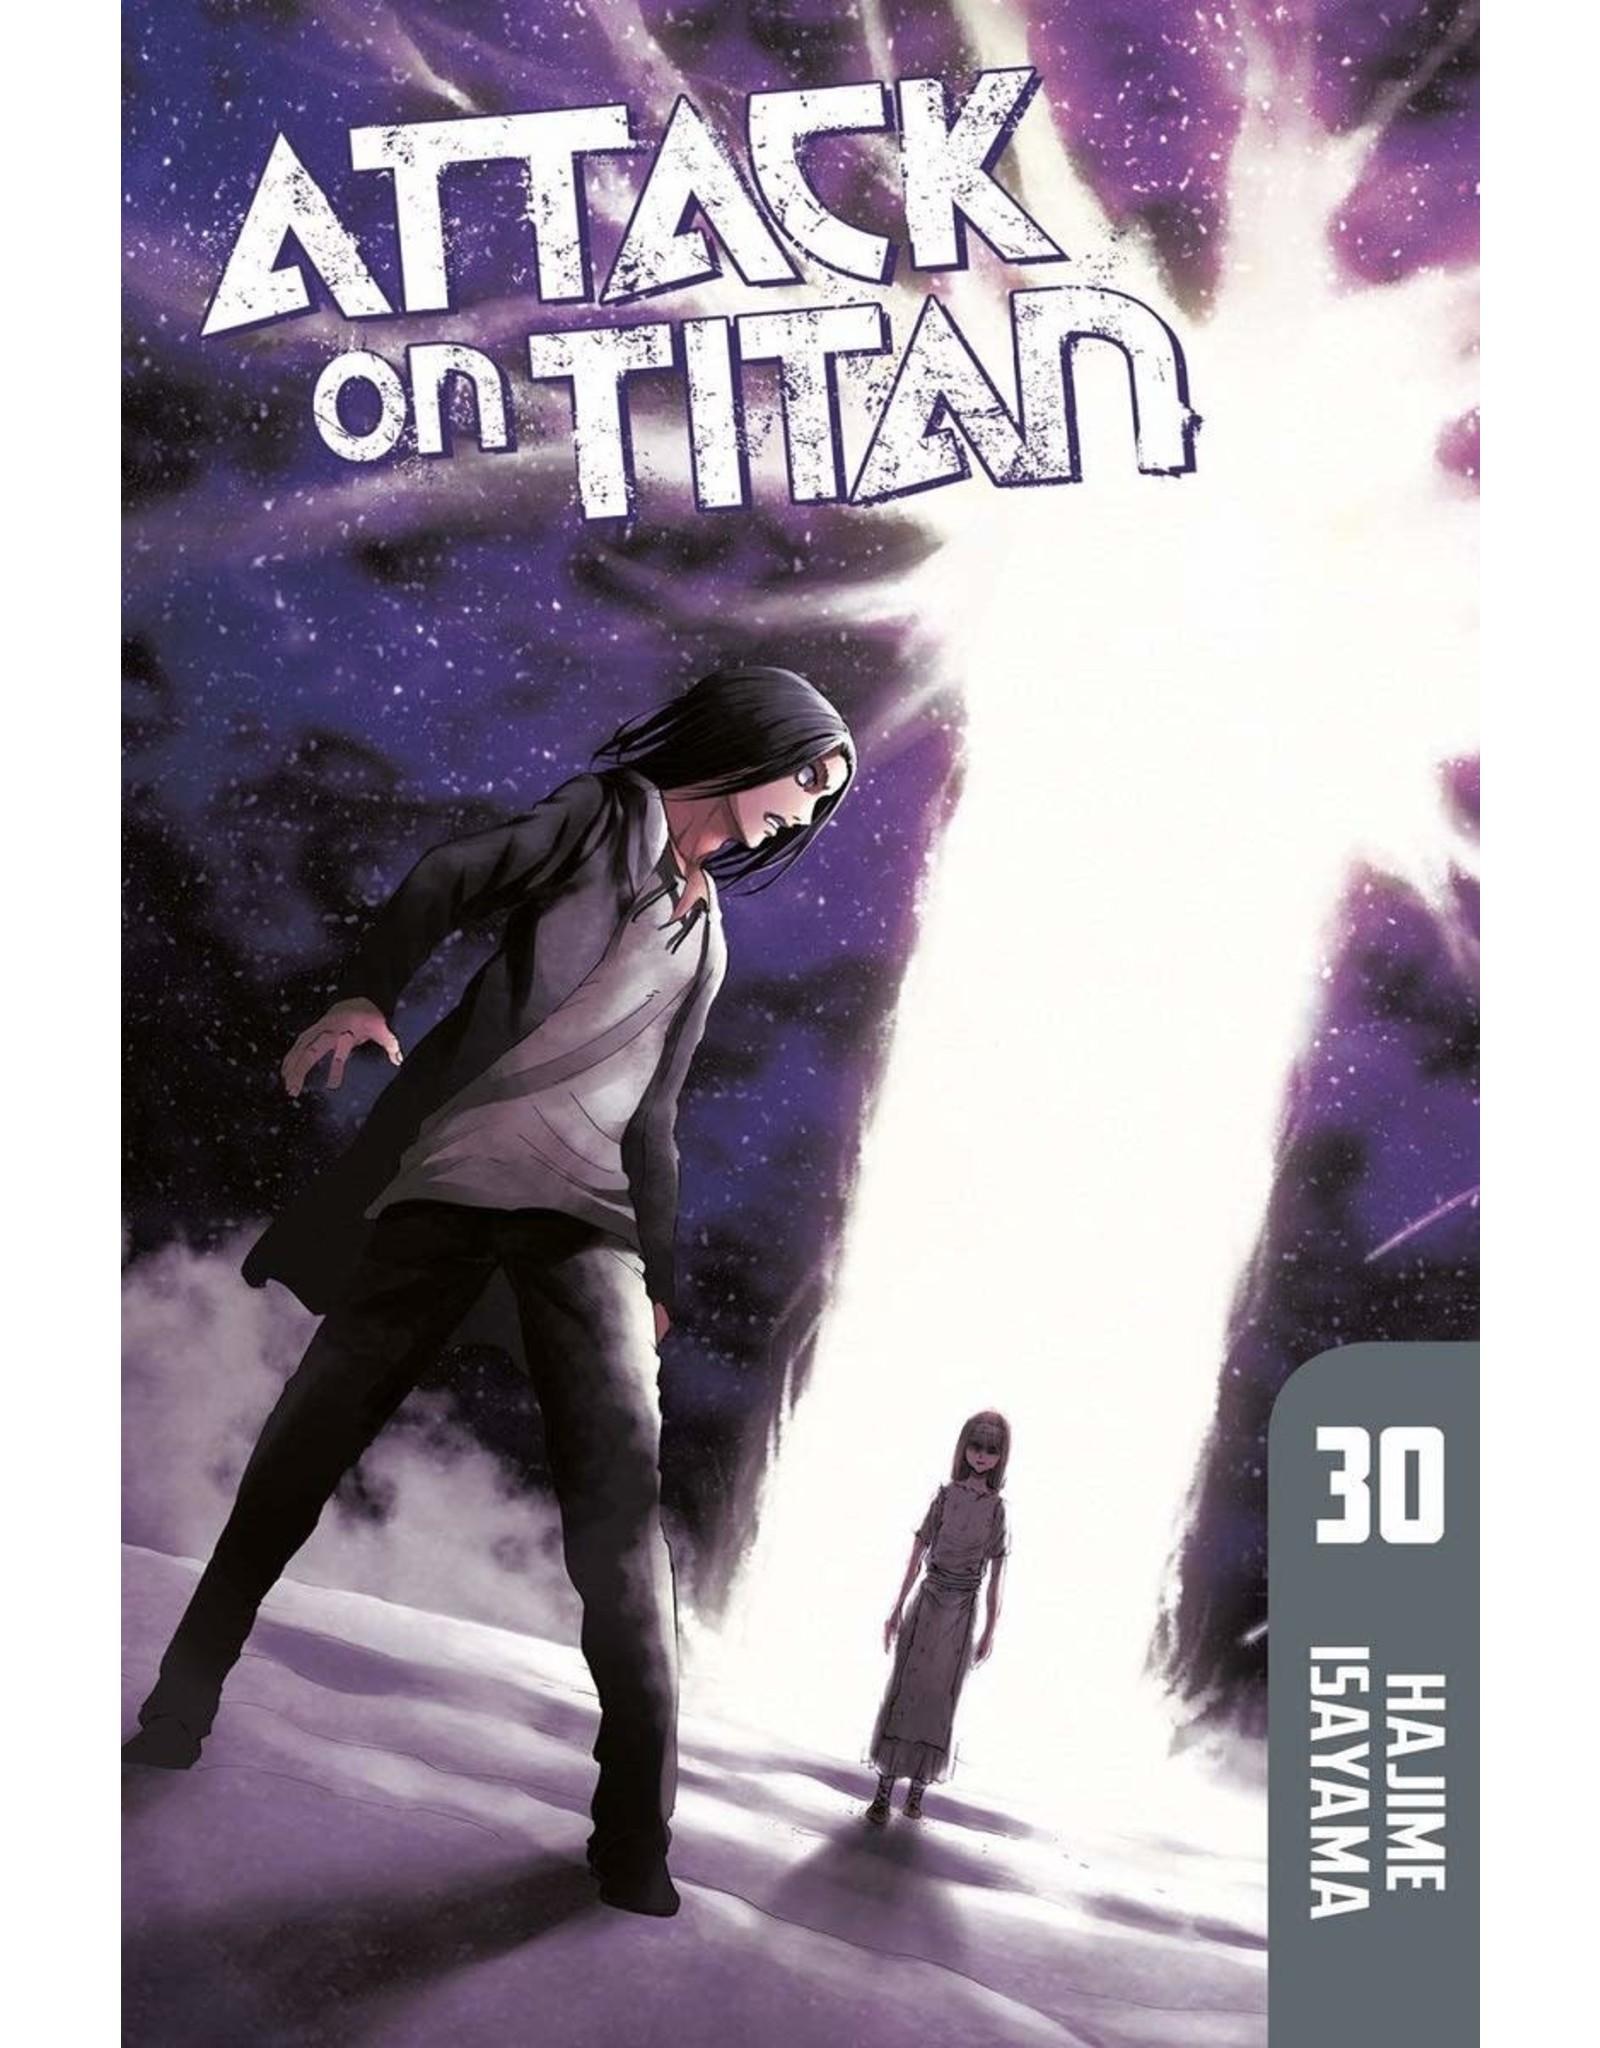 Attack on Titan 30 (English version)